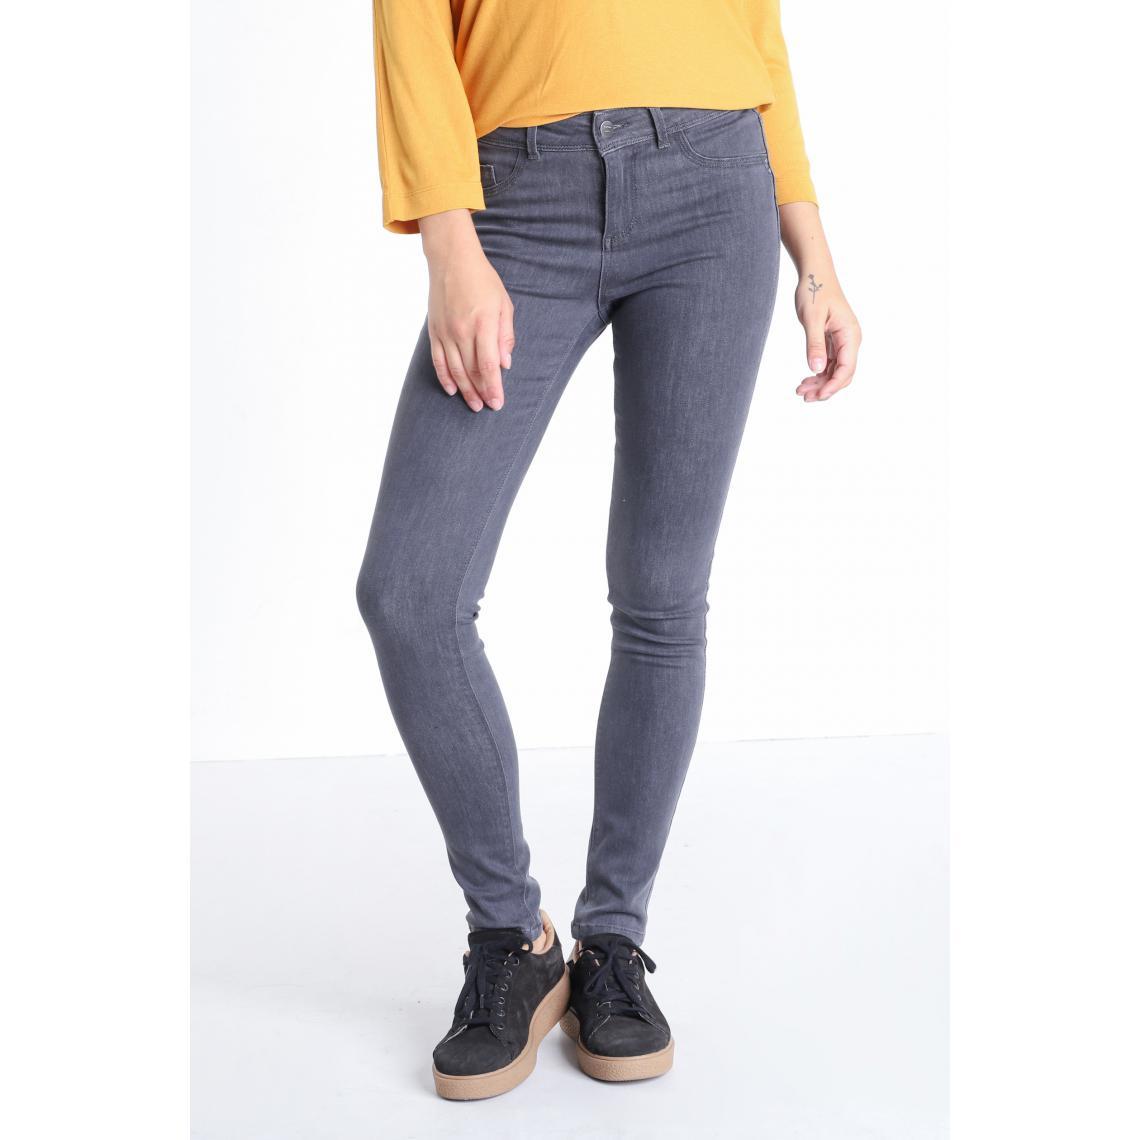 Jeans jegging skinny taille haute - Bonobo - Modalova